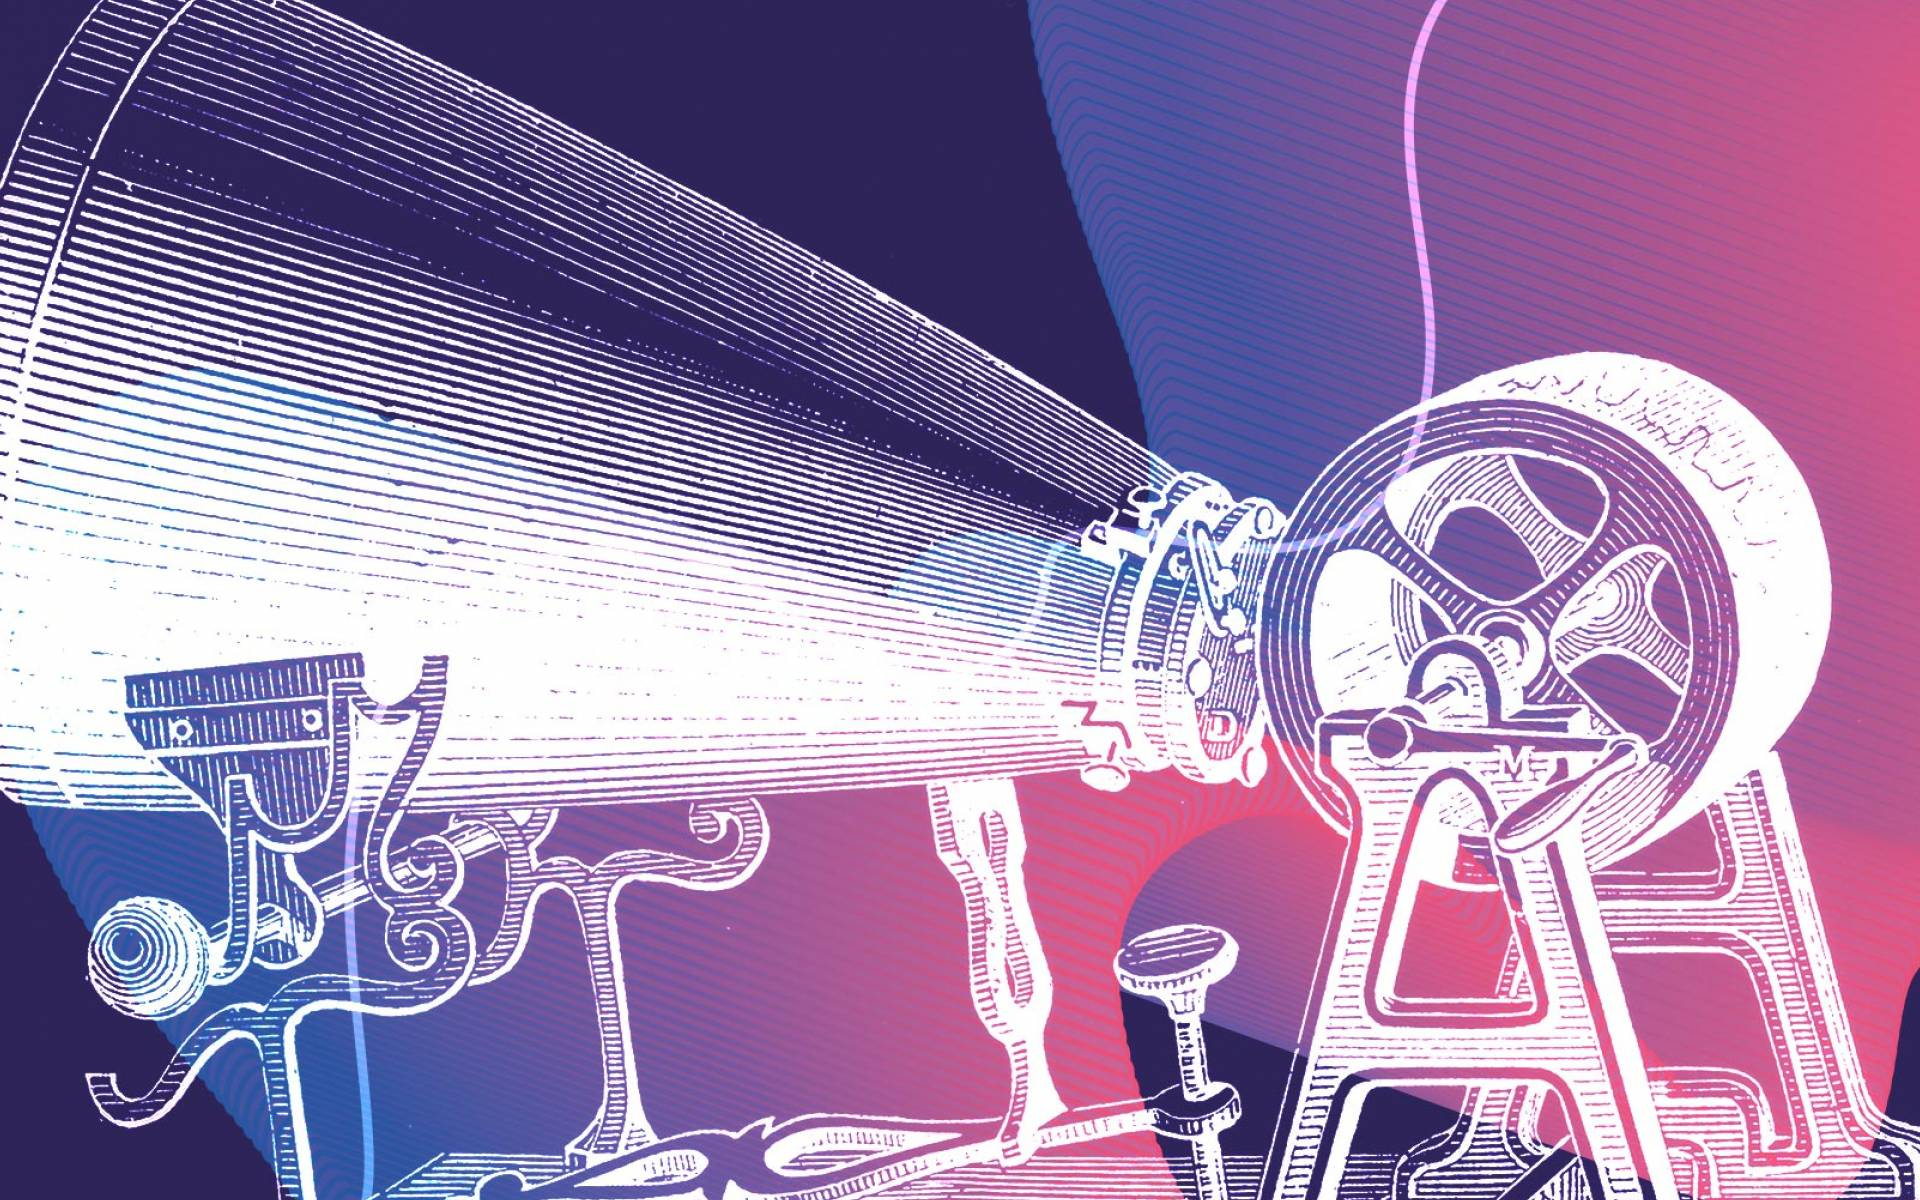 Analog and Digital sound